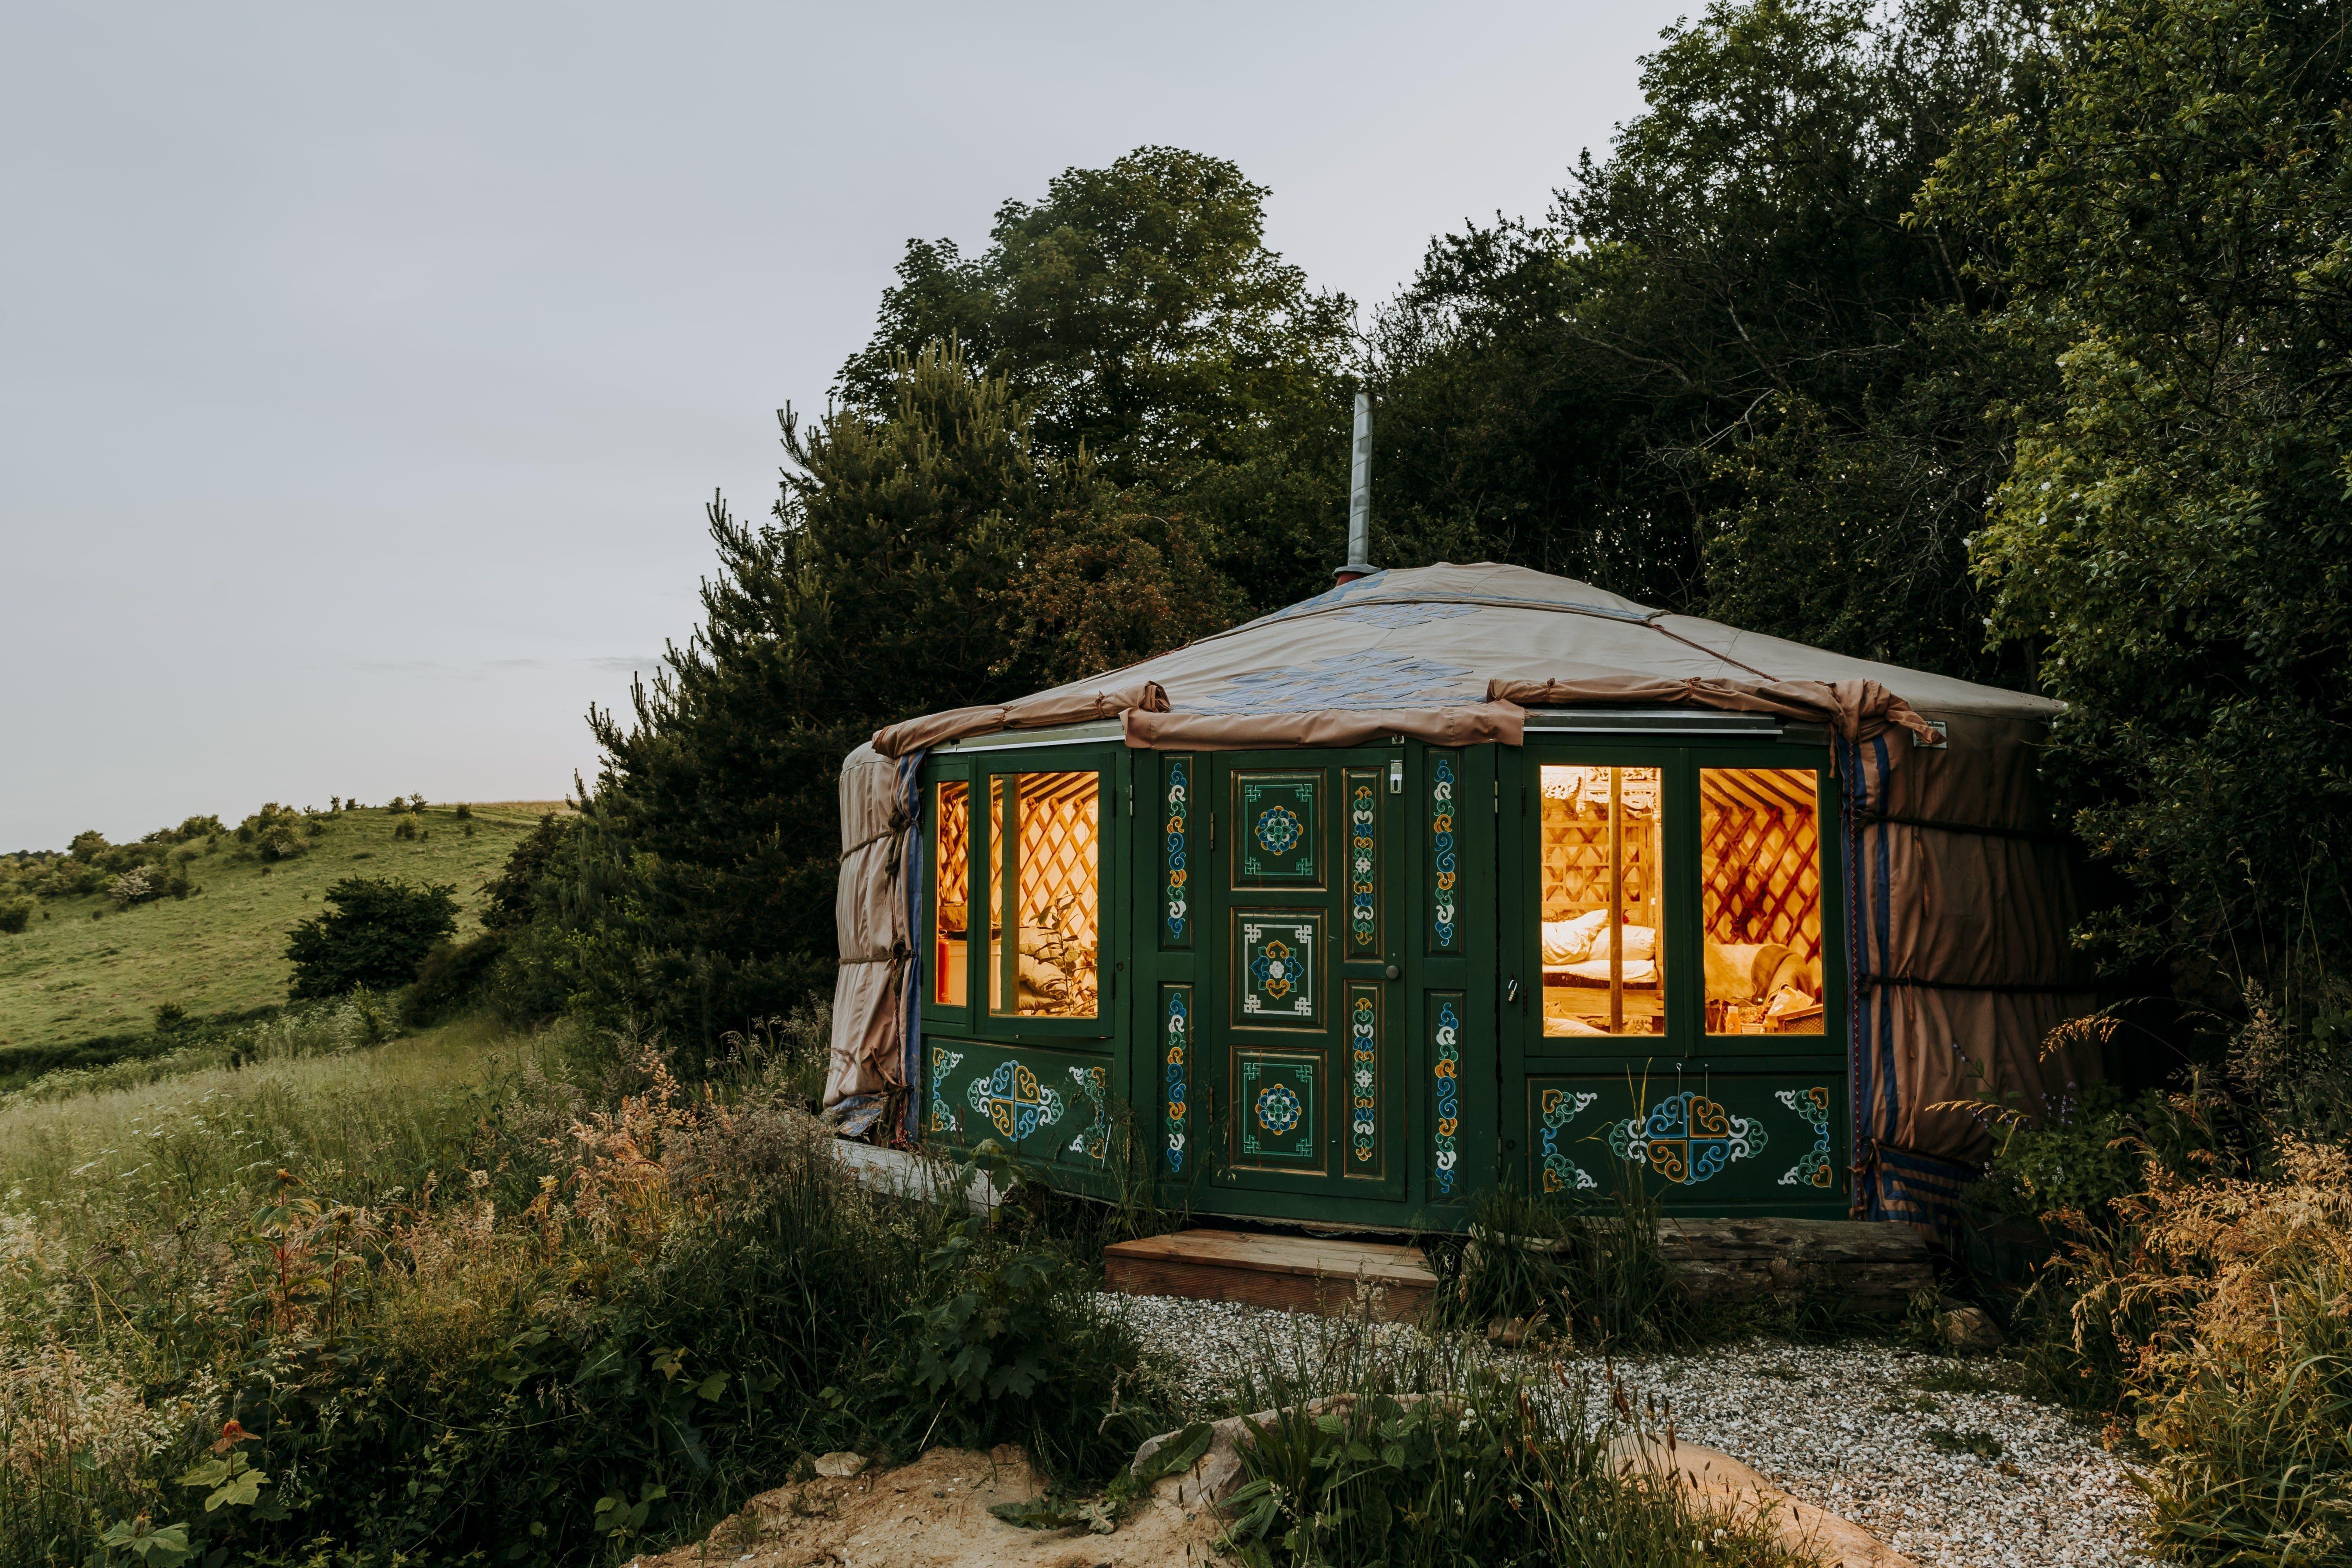 En unik glampingupplevelse med övernattning mitt i Danmarks natur